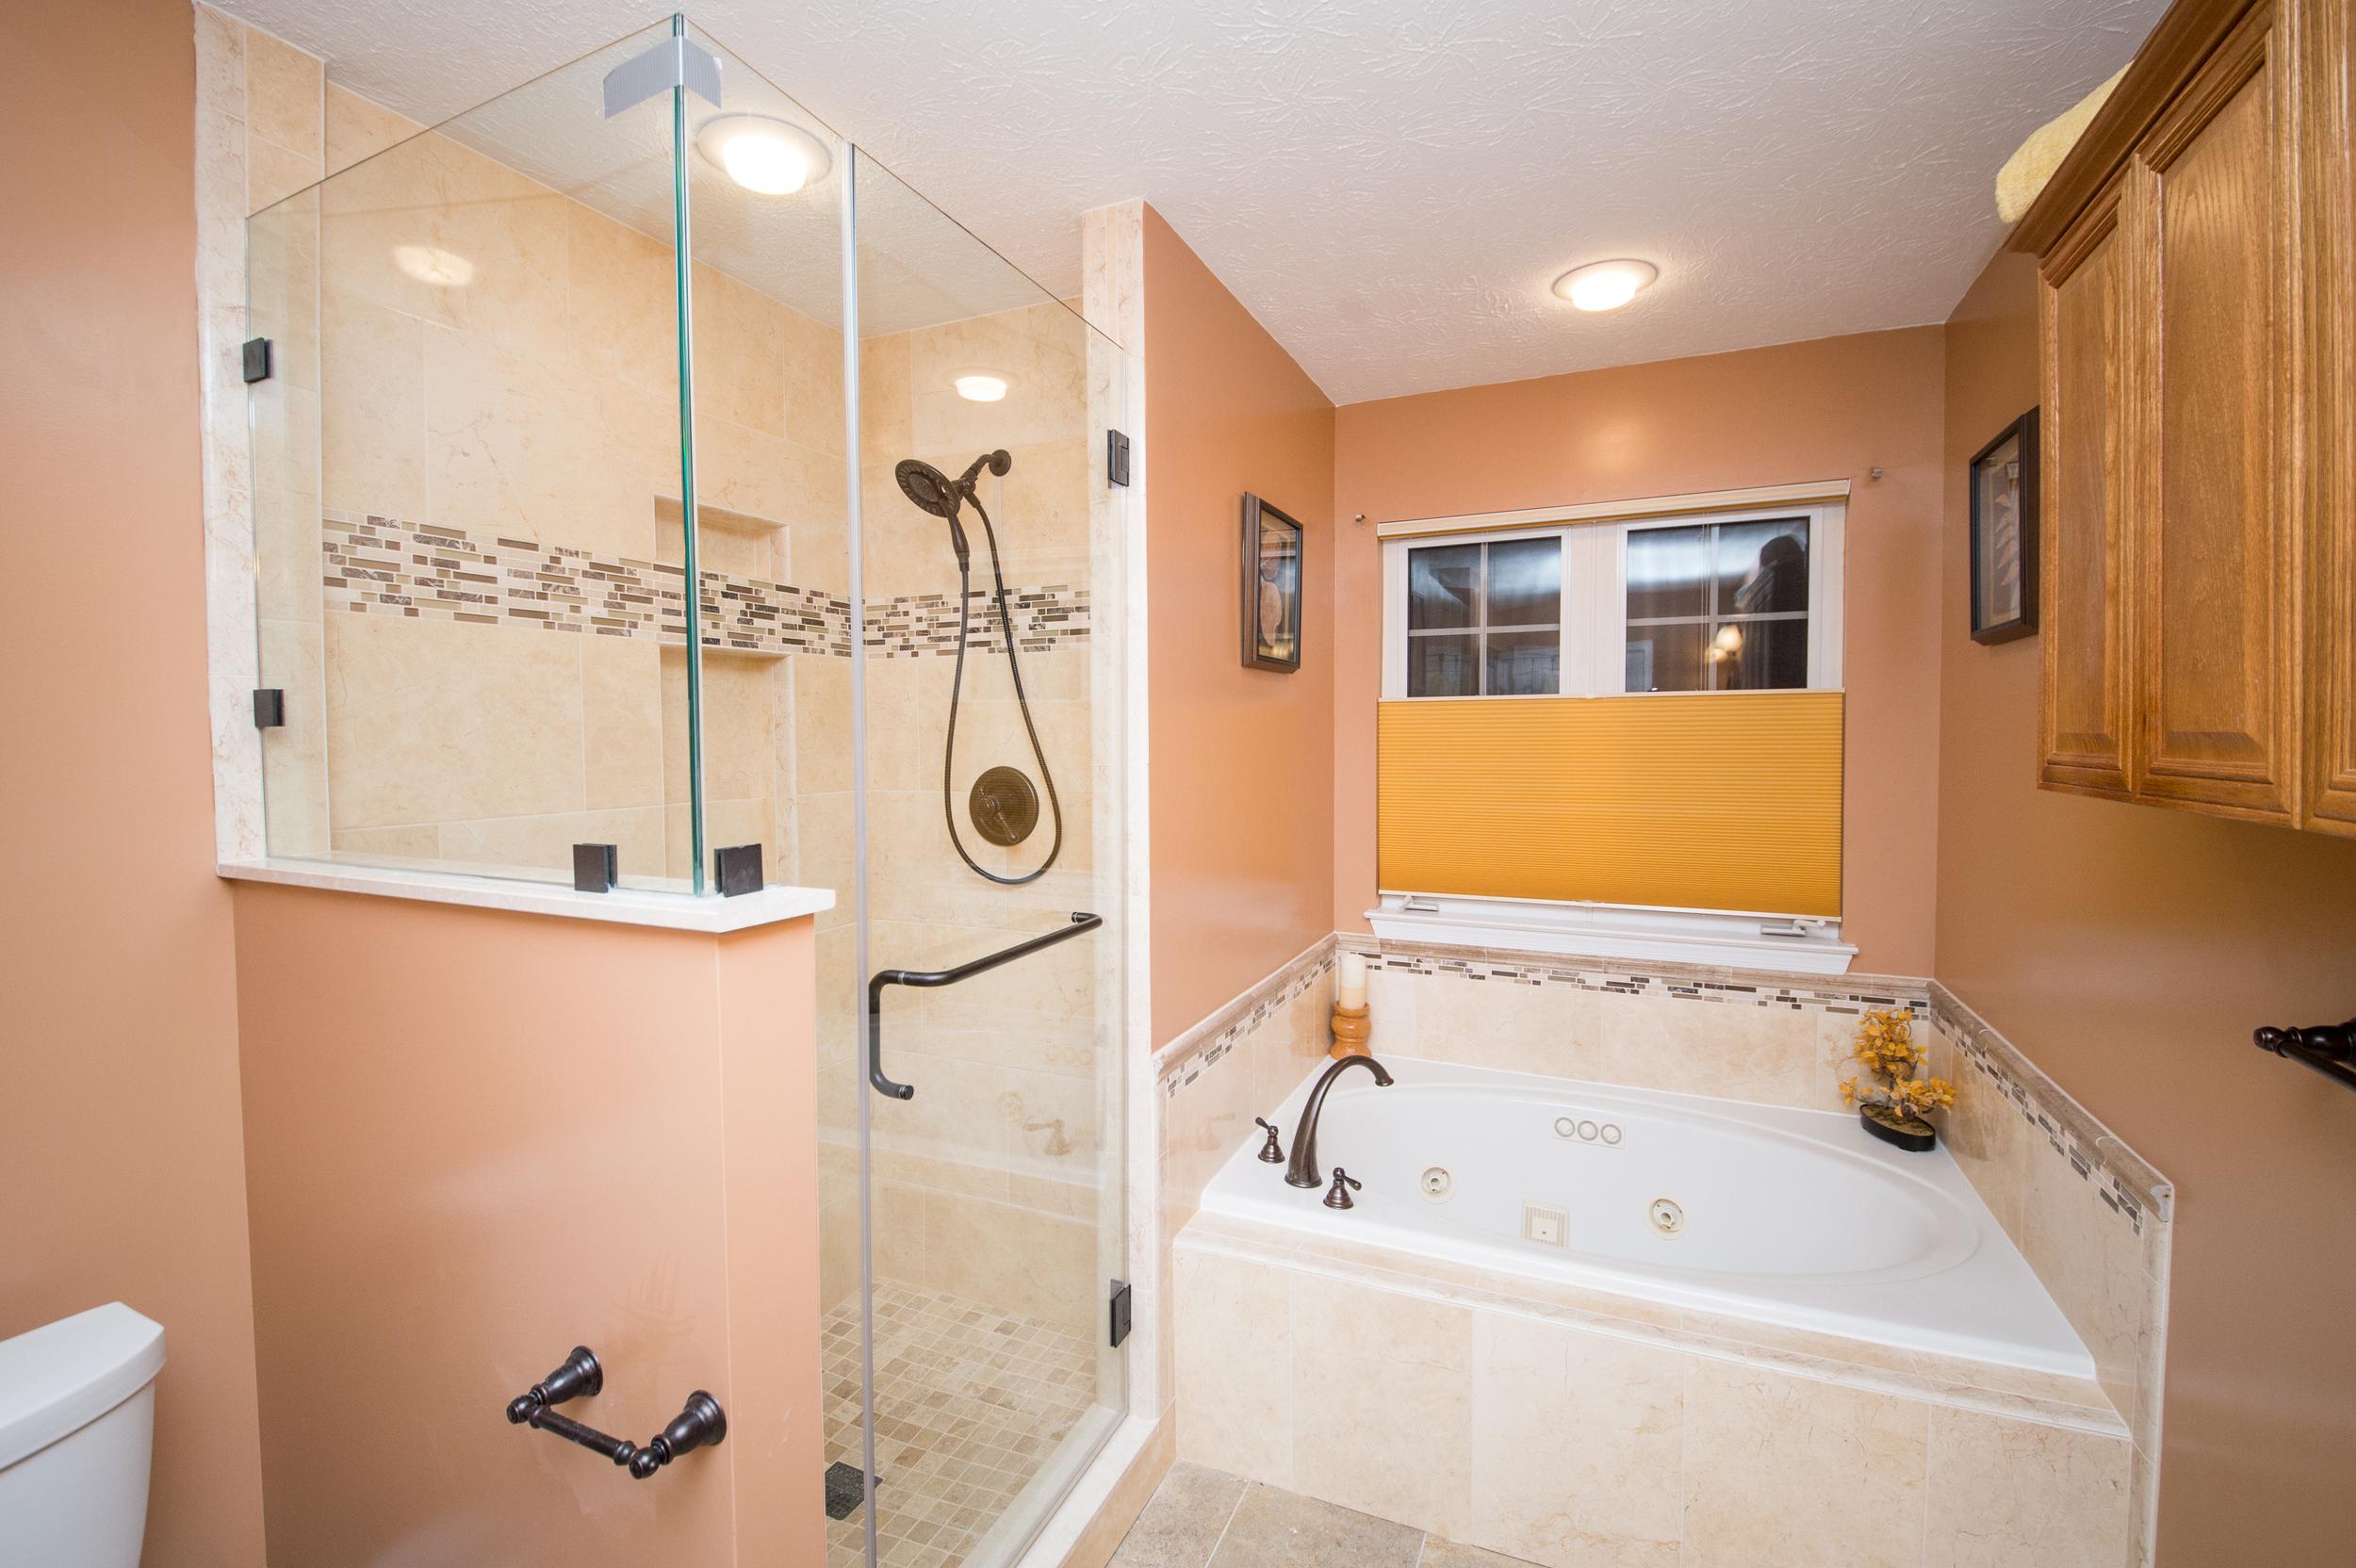 Bathroom Remodel Wheaton, MD